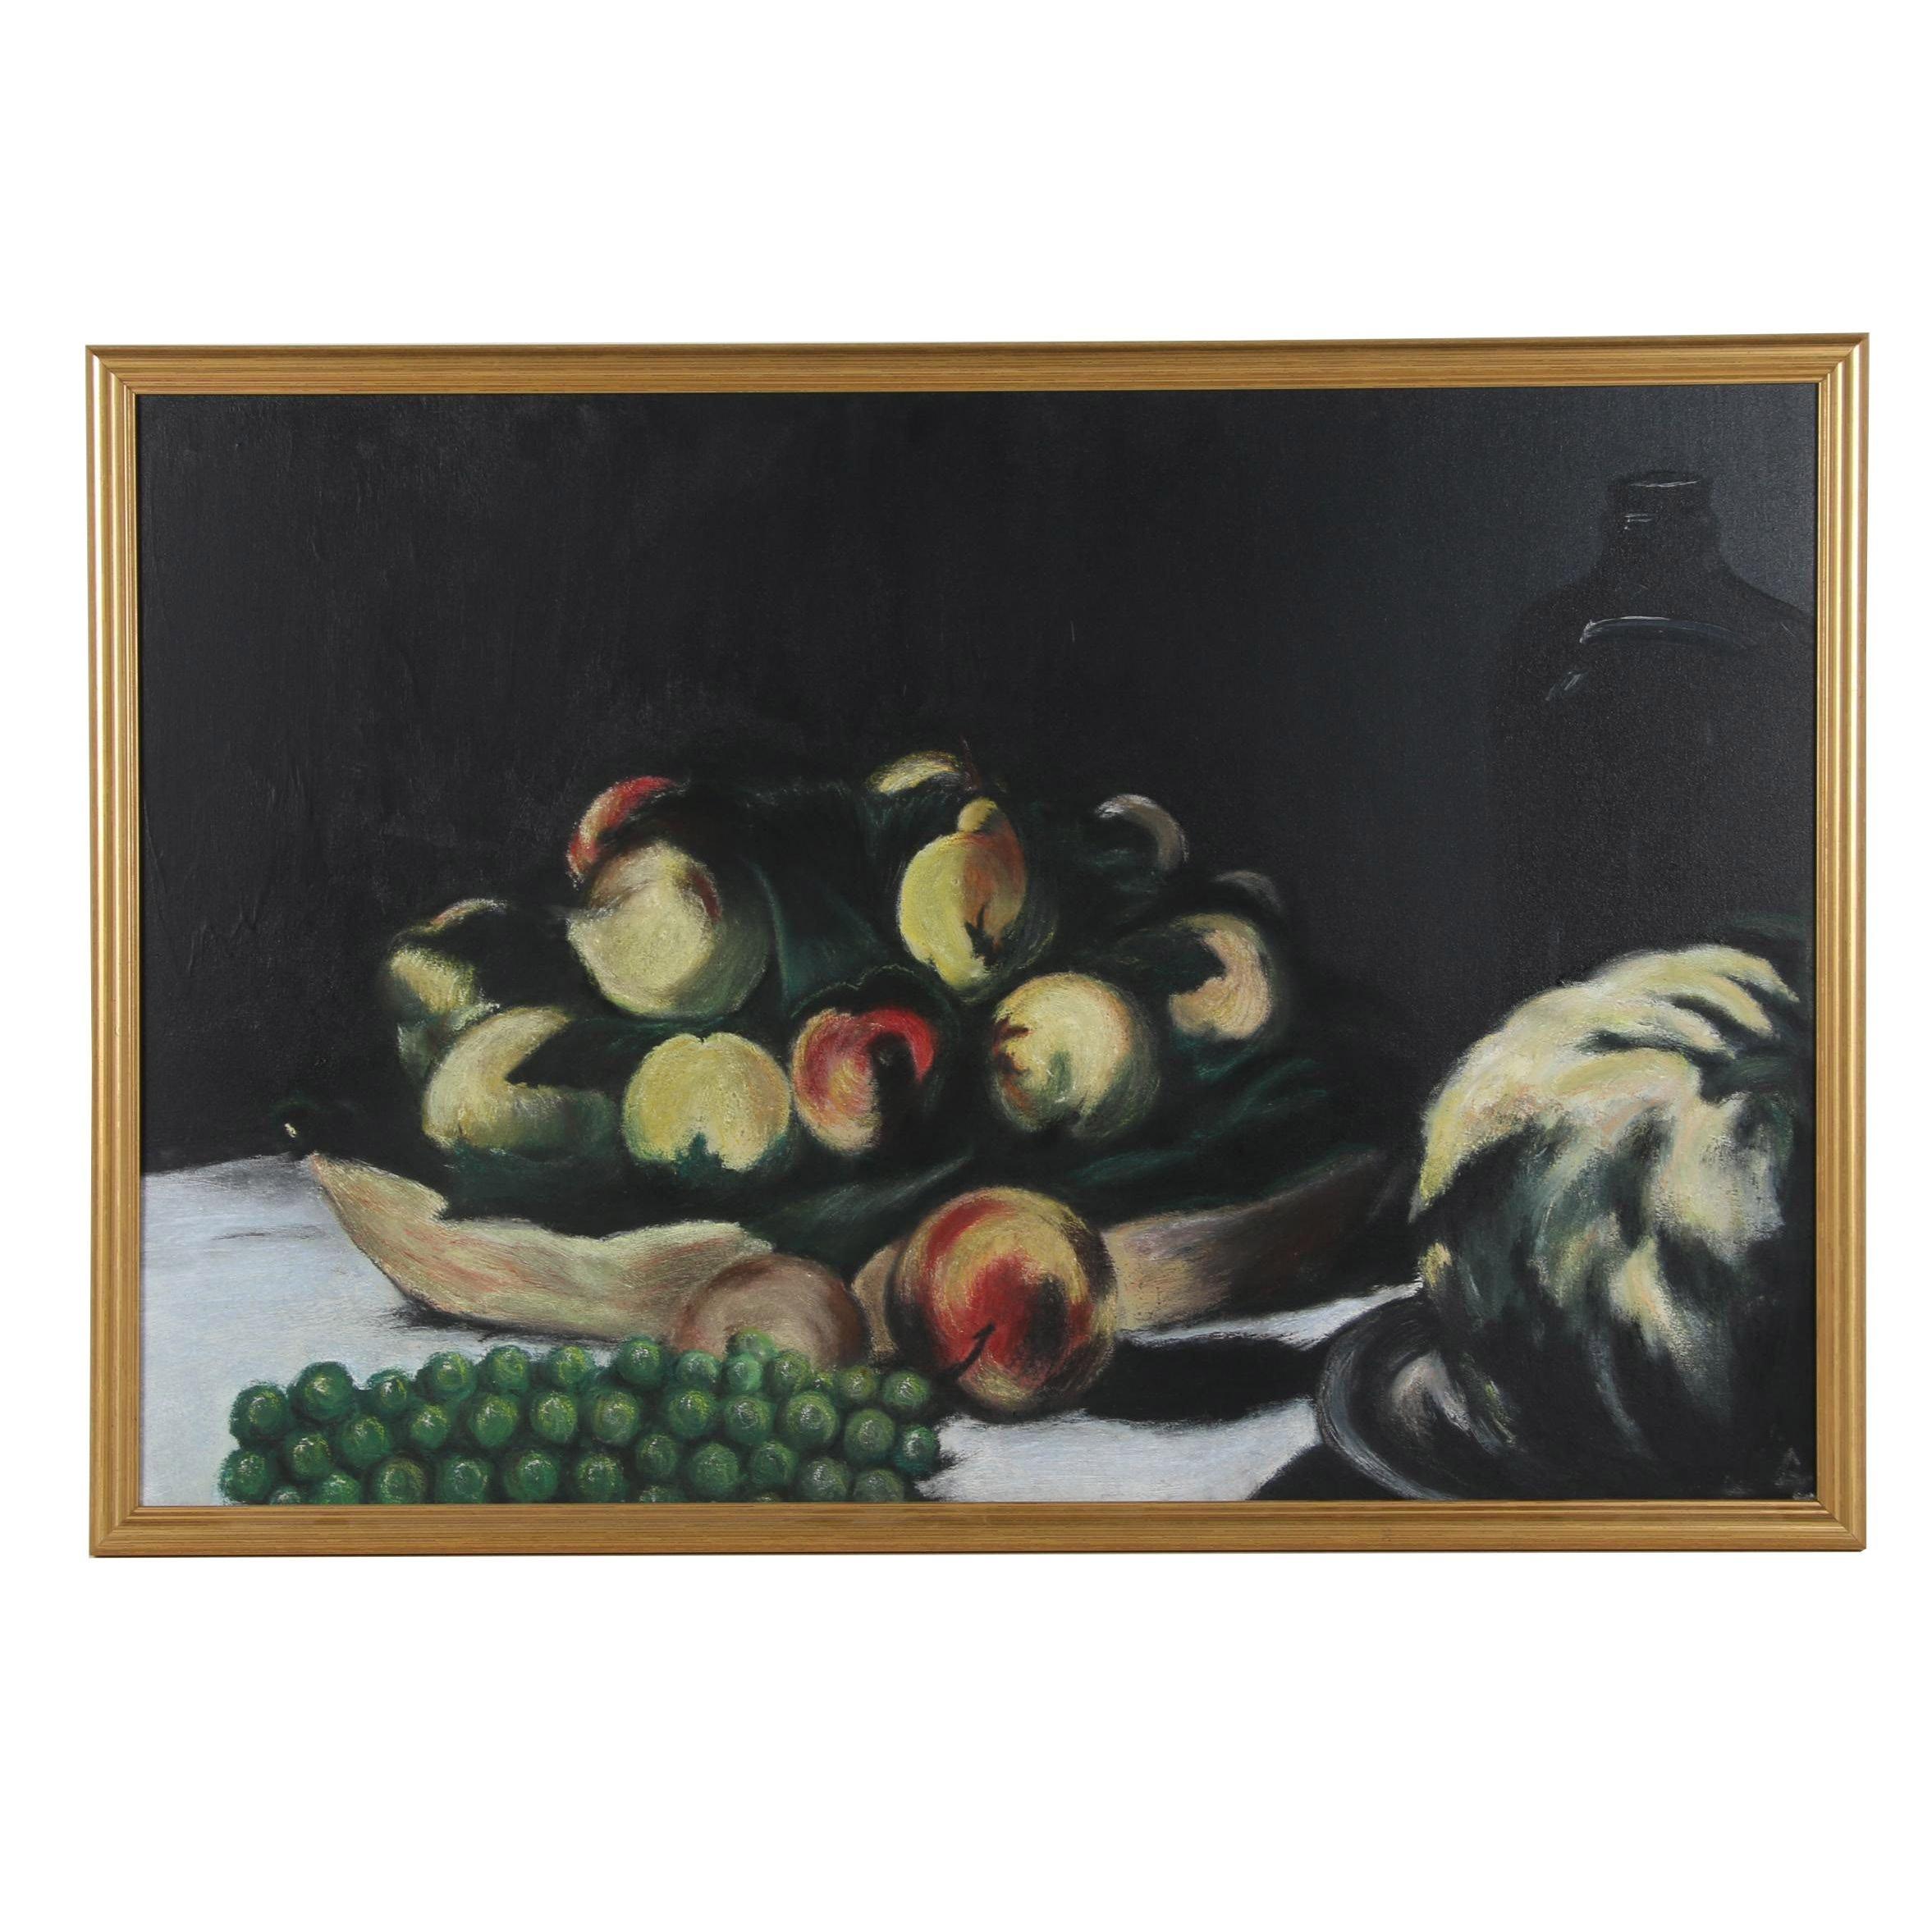 20th Century Still life Oil Painting